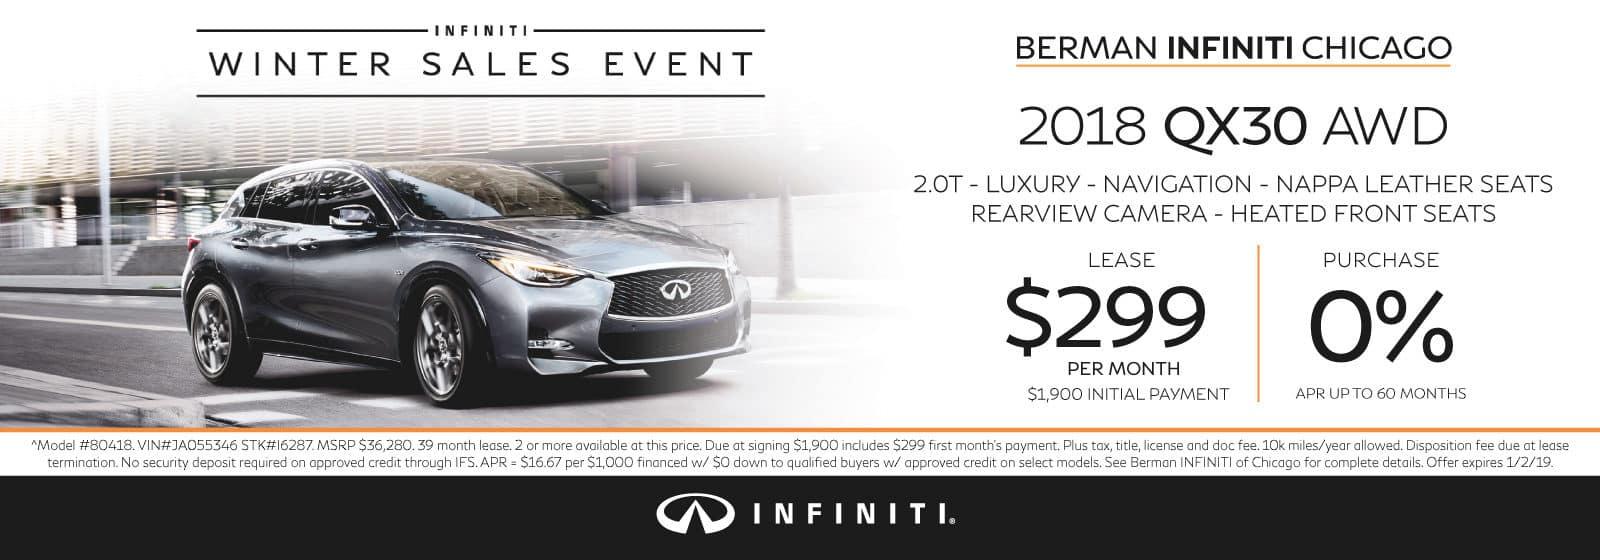 New 2018 INFINITI QX30 December offer at Berman INFINITI Chicago!